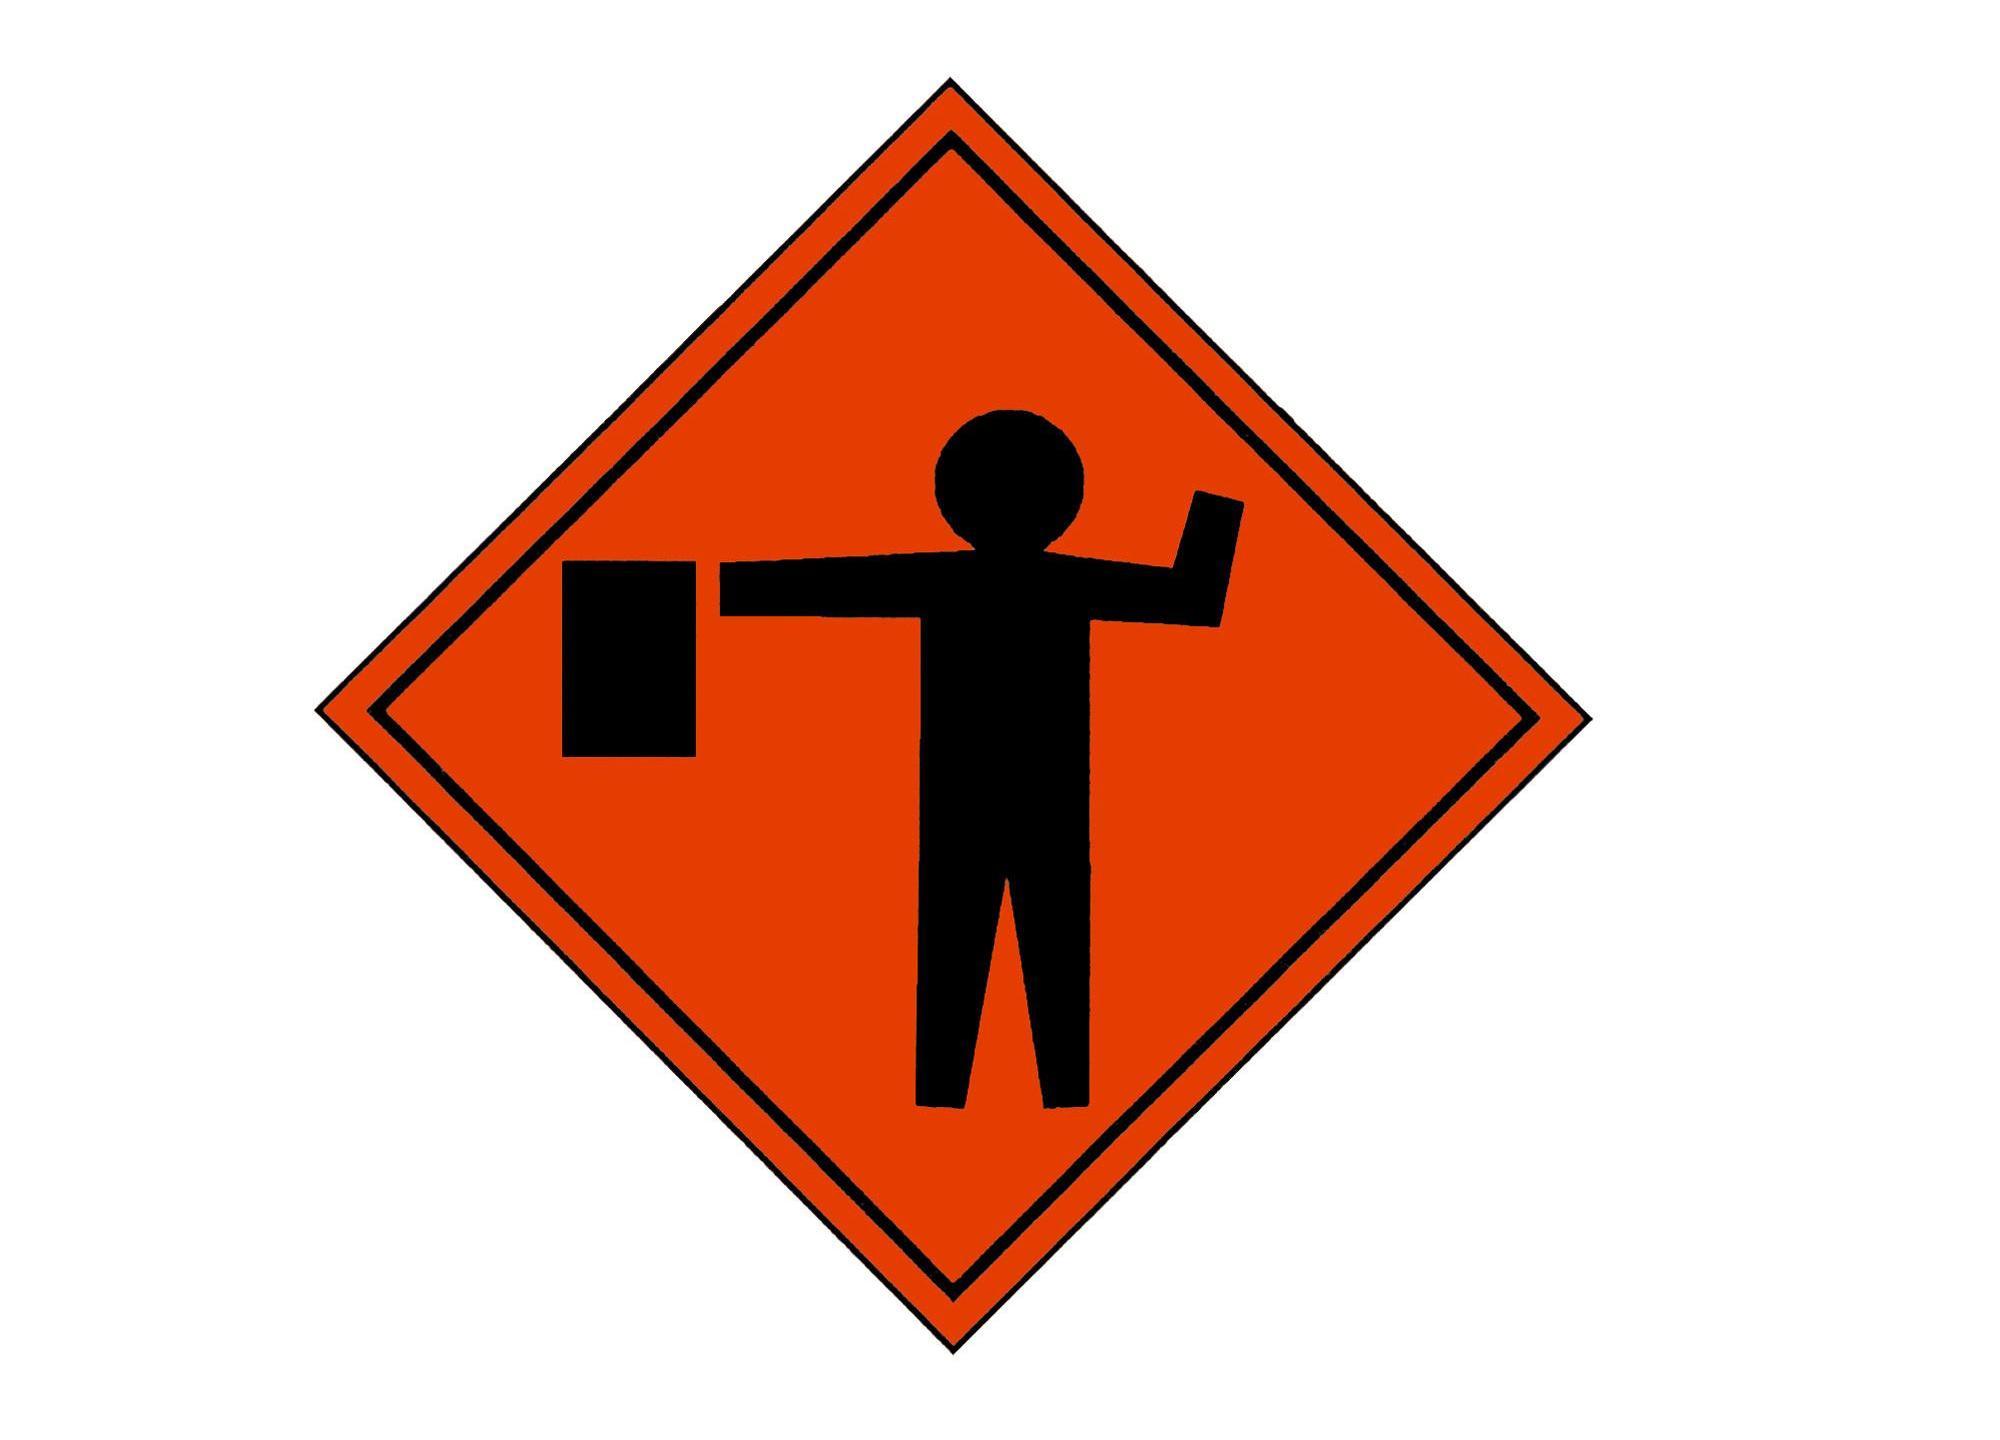 ap_00113001279 traffic flagger road work traffic alert_216579